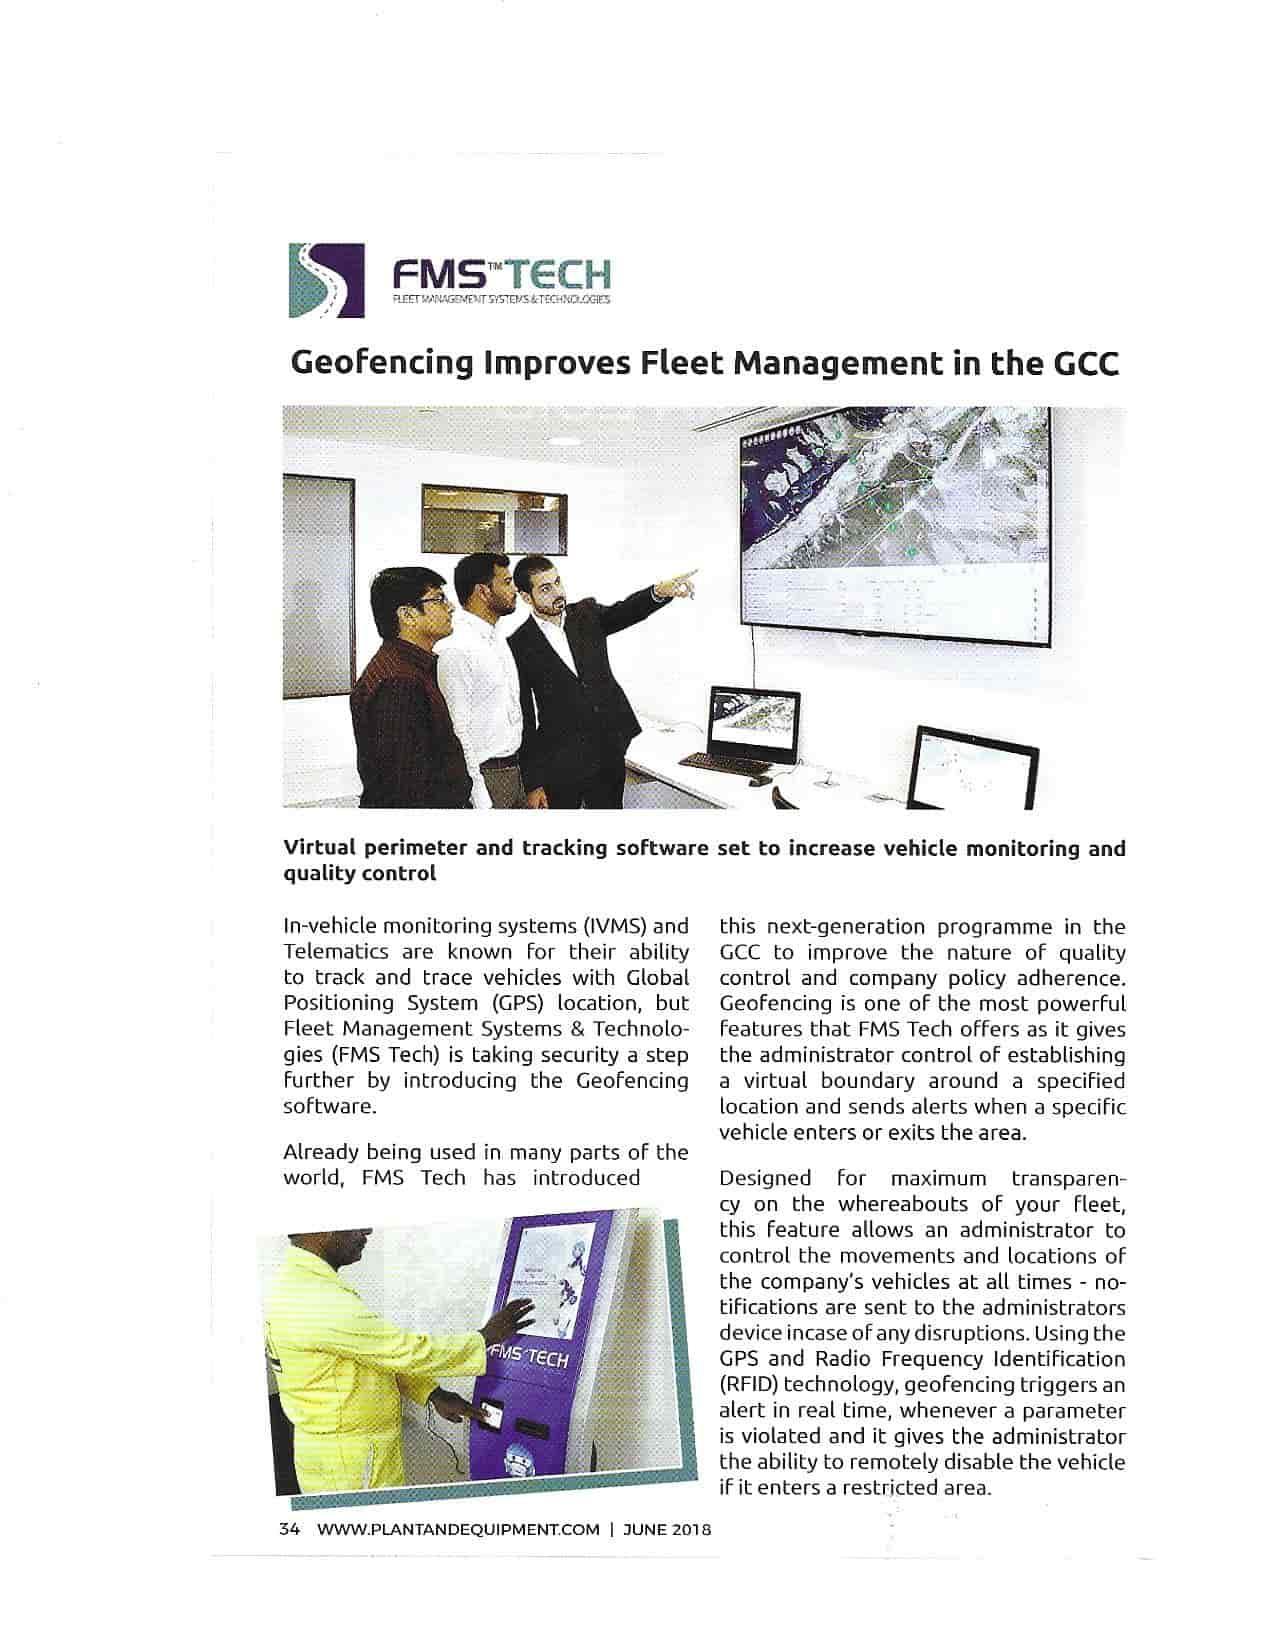 fms tech pr and marketing by sociate 02